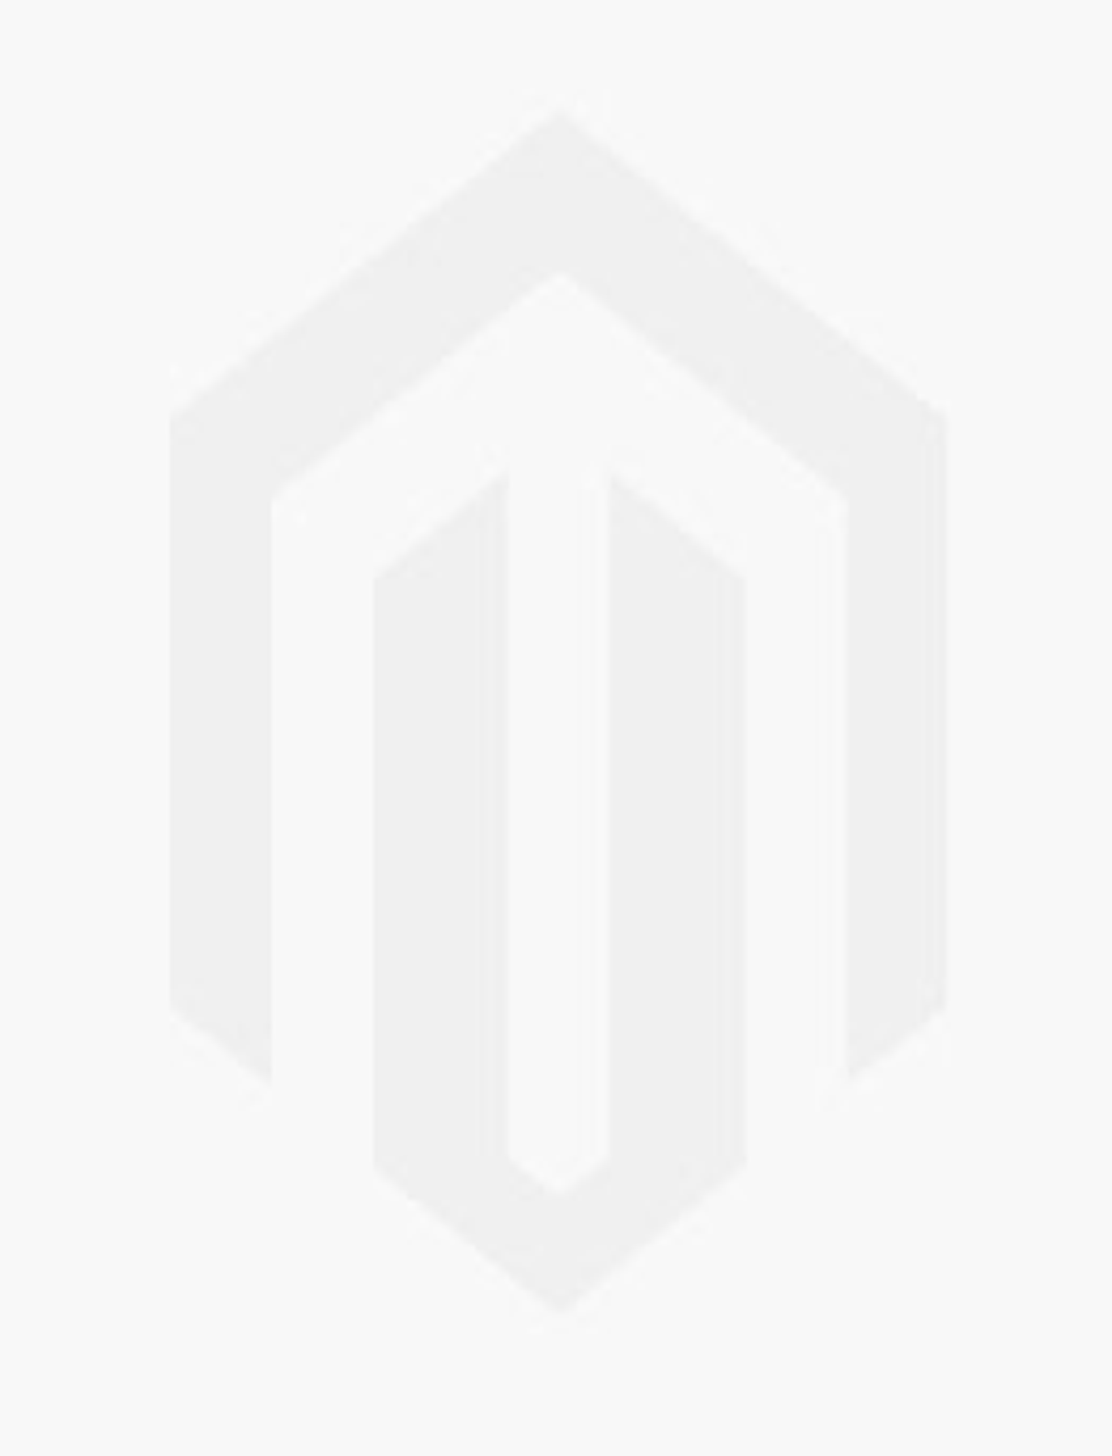 5mm Rose Cut Diamond Pave Ouroboros Threaded Stud Image #1